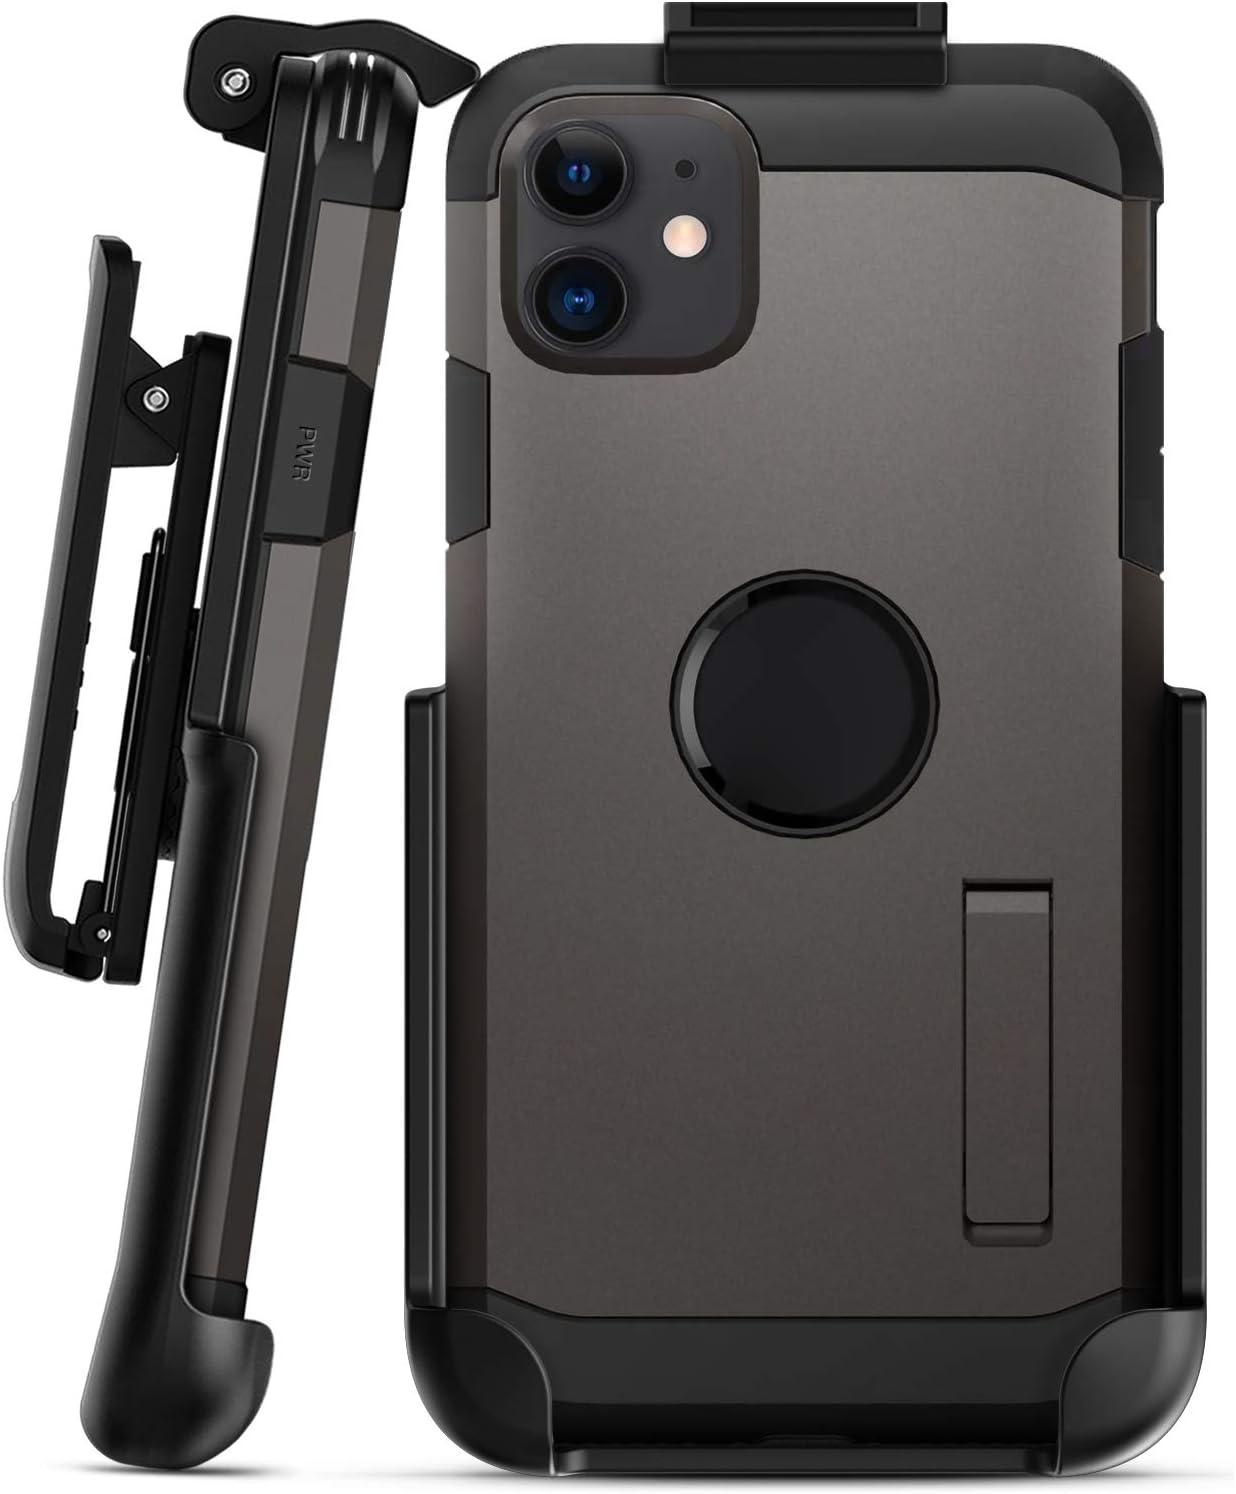 Encased Belt Clip Holster for Spigen Tough Armor - iPhone 11 (Holster Only - Case is not Included)